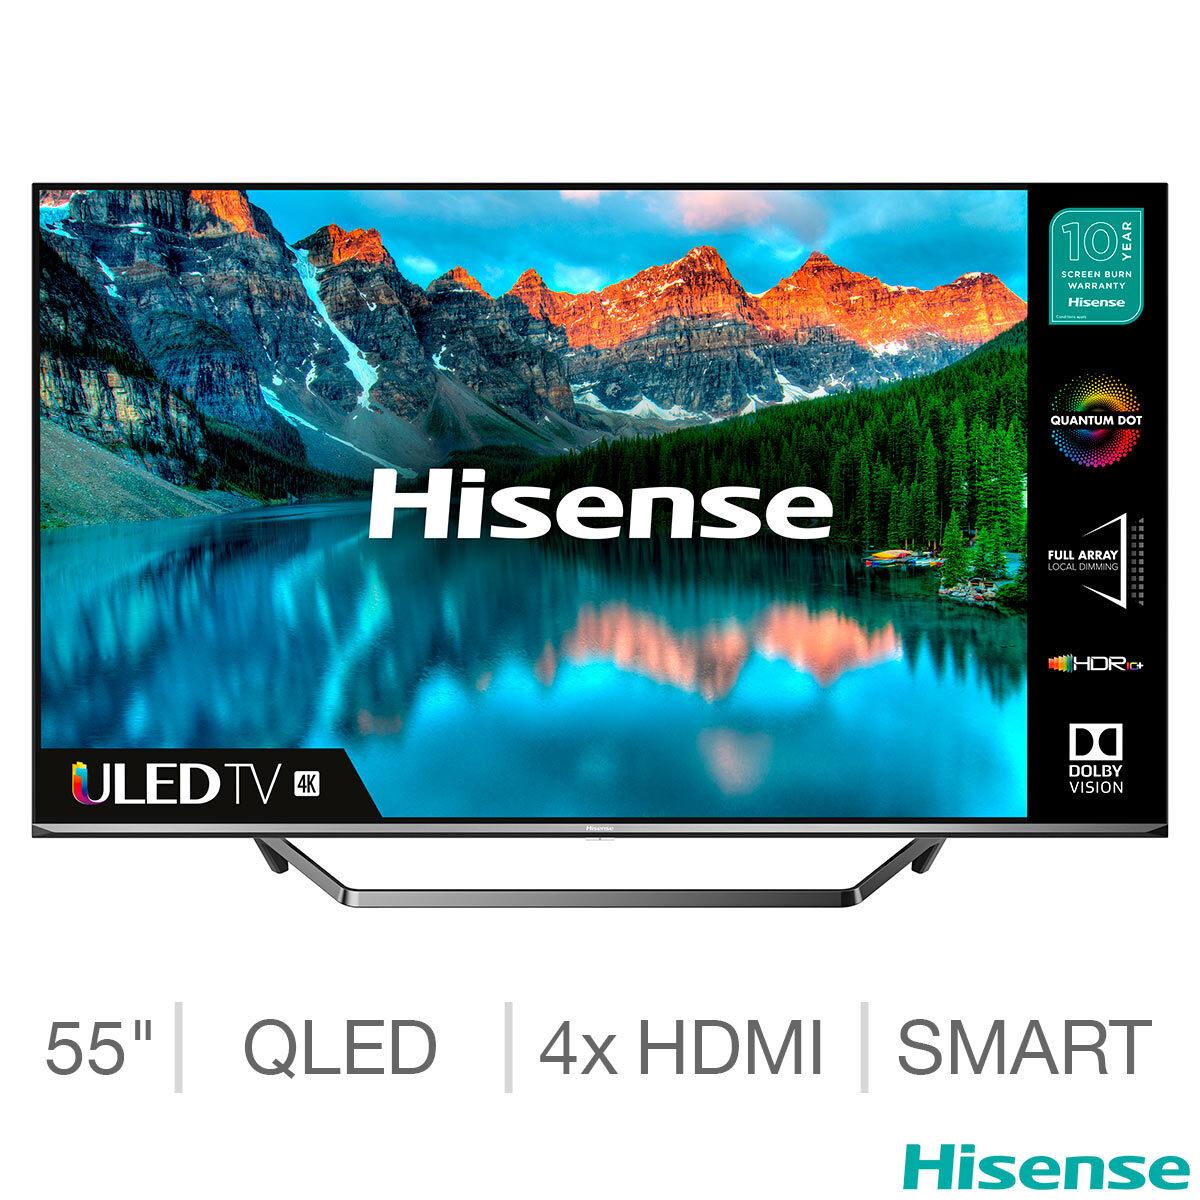 Hisense 50U7QFTUK 50 Inch QLED 4K Ultra HD Smart TV with Alexa - £395.98 (instore) Membership Required @ Costco